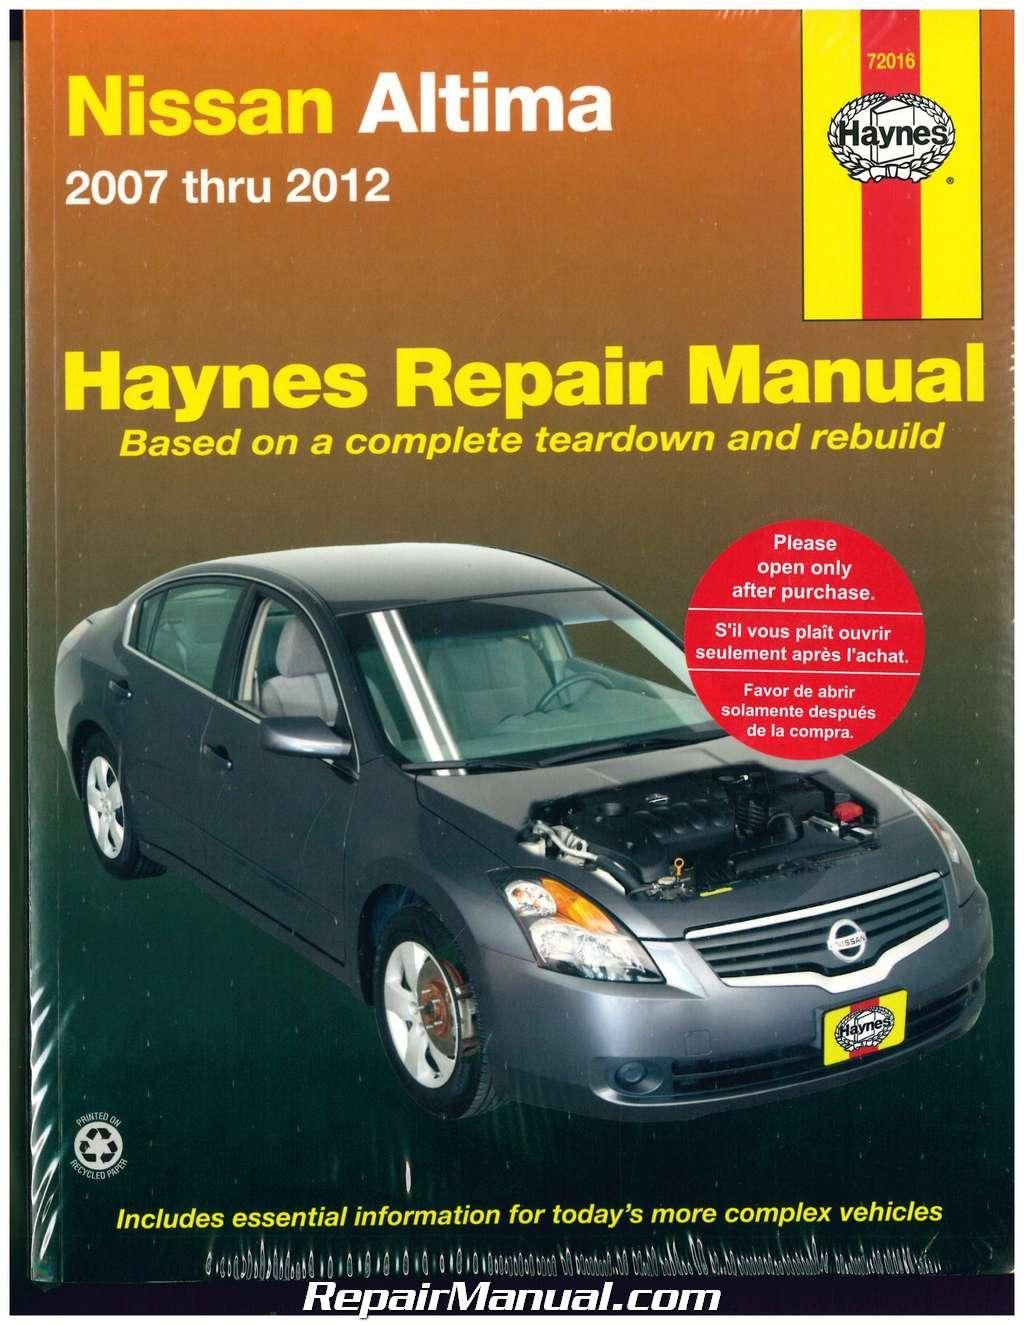 haynes nissan altima 2007 2012 auto repair manual. Black Bedroom Furniture Sets. Home Design Ideas